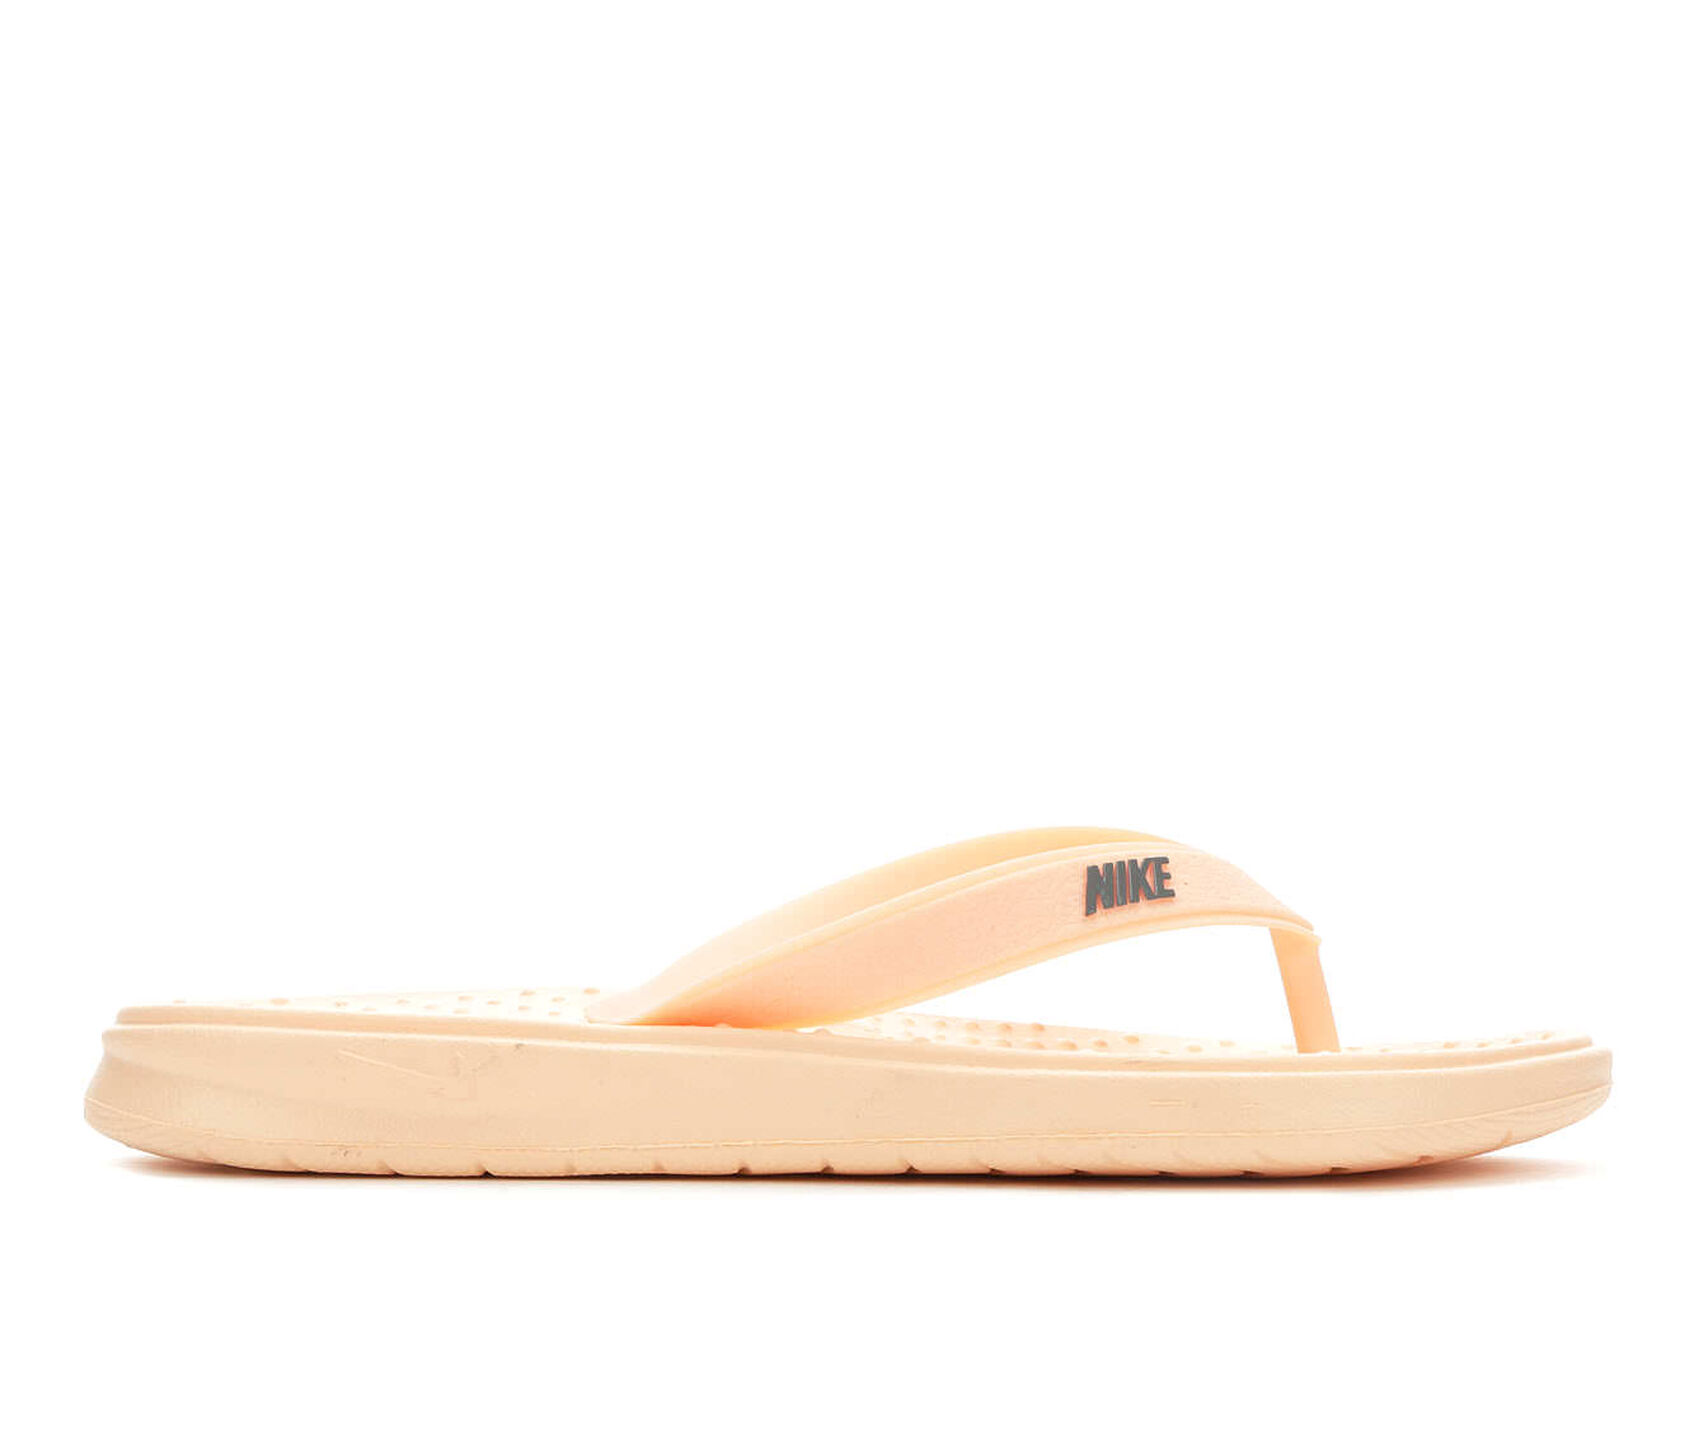 09e16e3dcbd5 ... Nike Solay Flip-Flop Sport Sandals. Previous